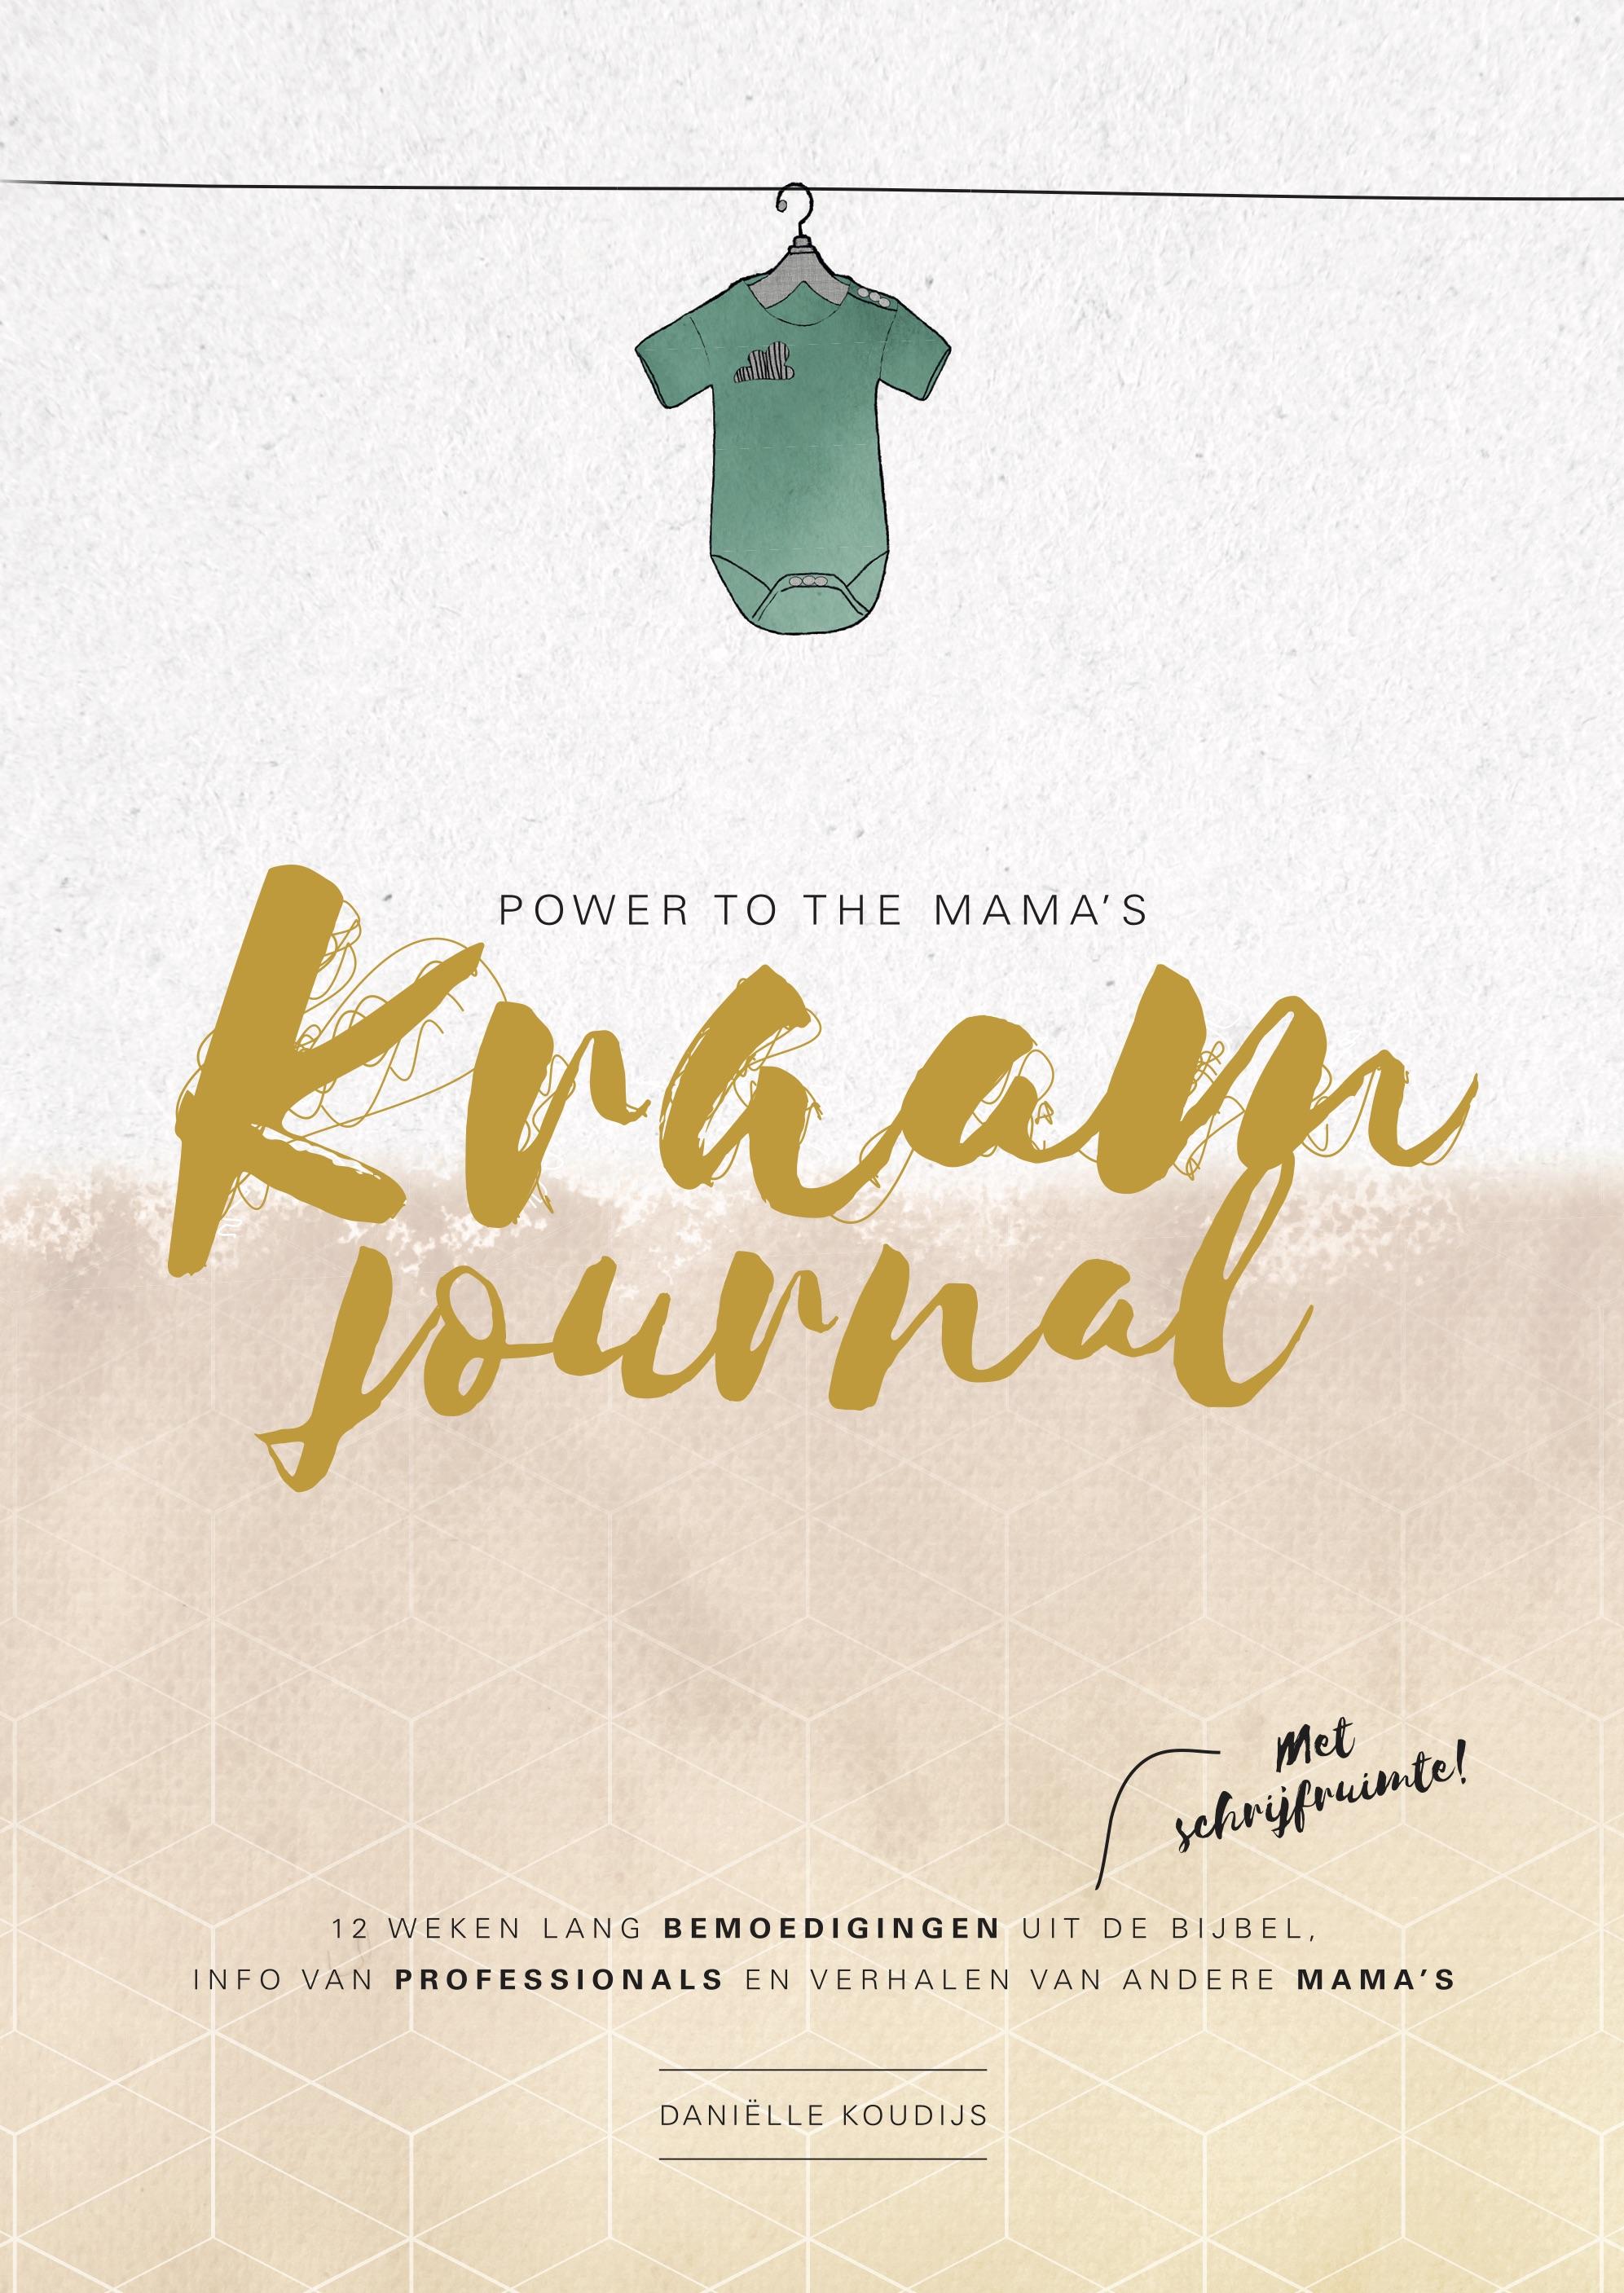 Power to the Mama's kraamjournal